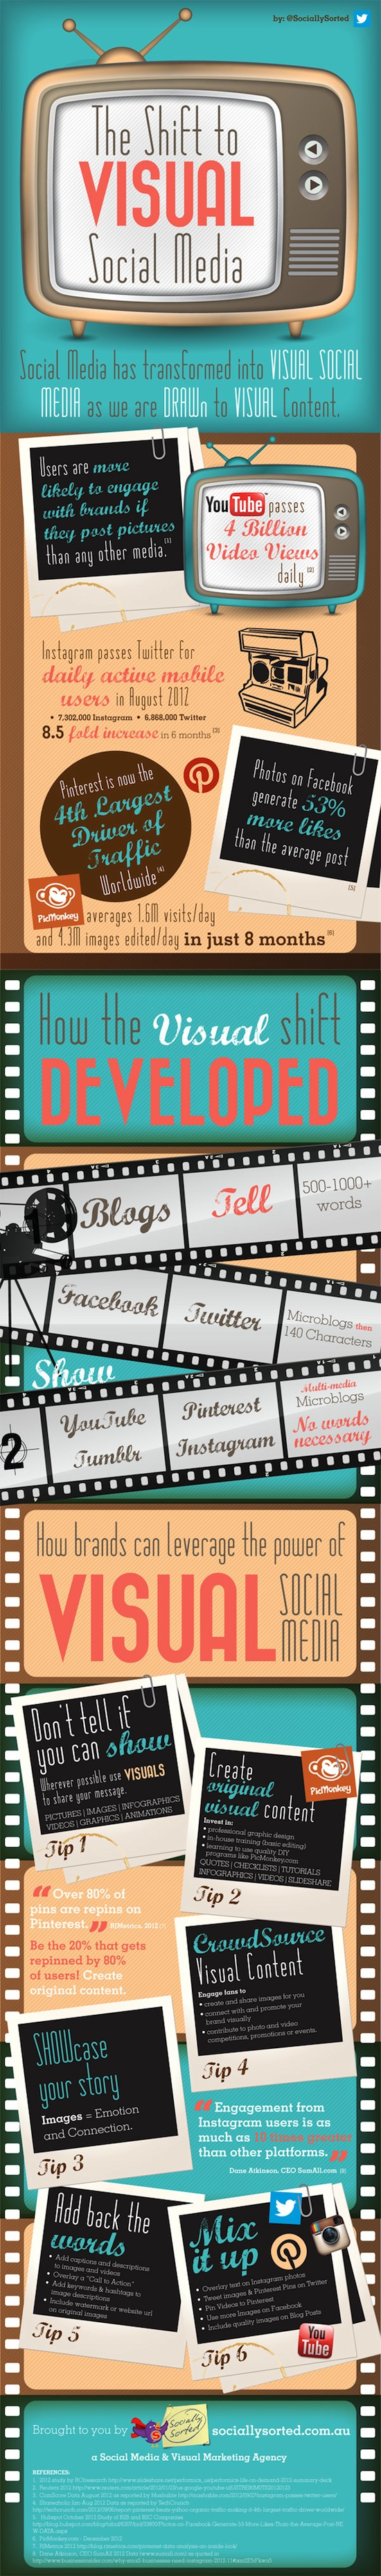 visuels-médias-sociaux-hubspot